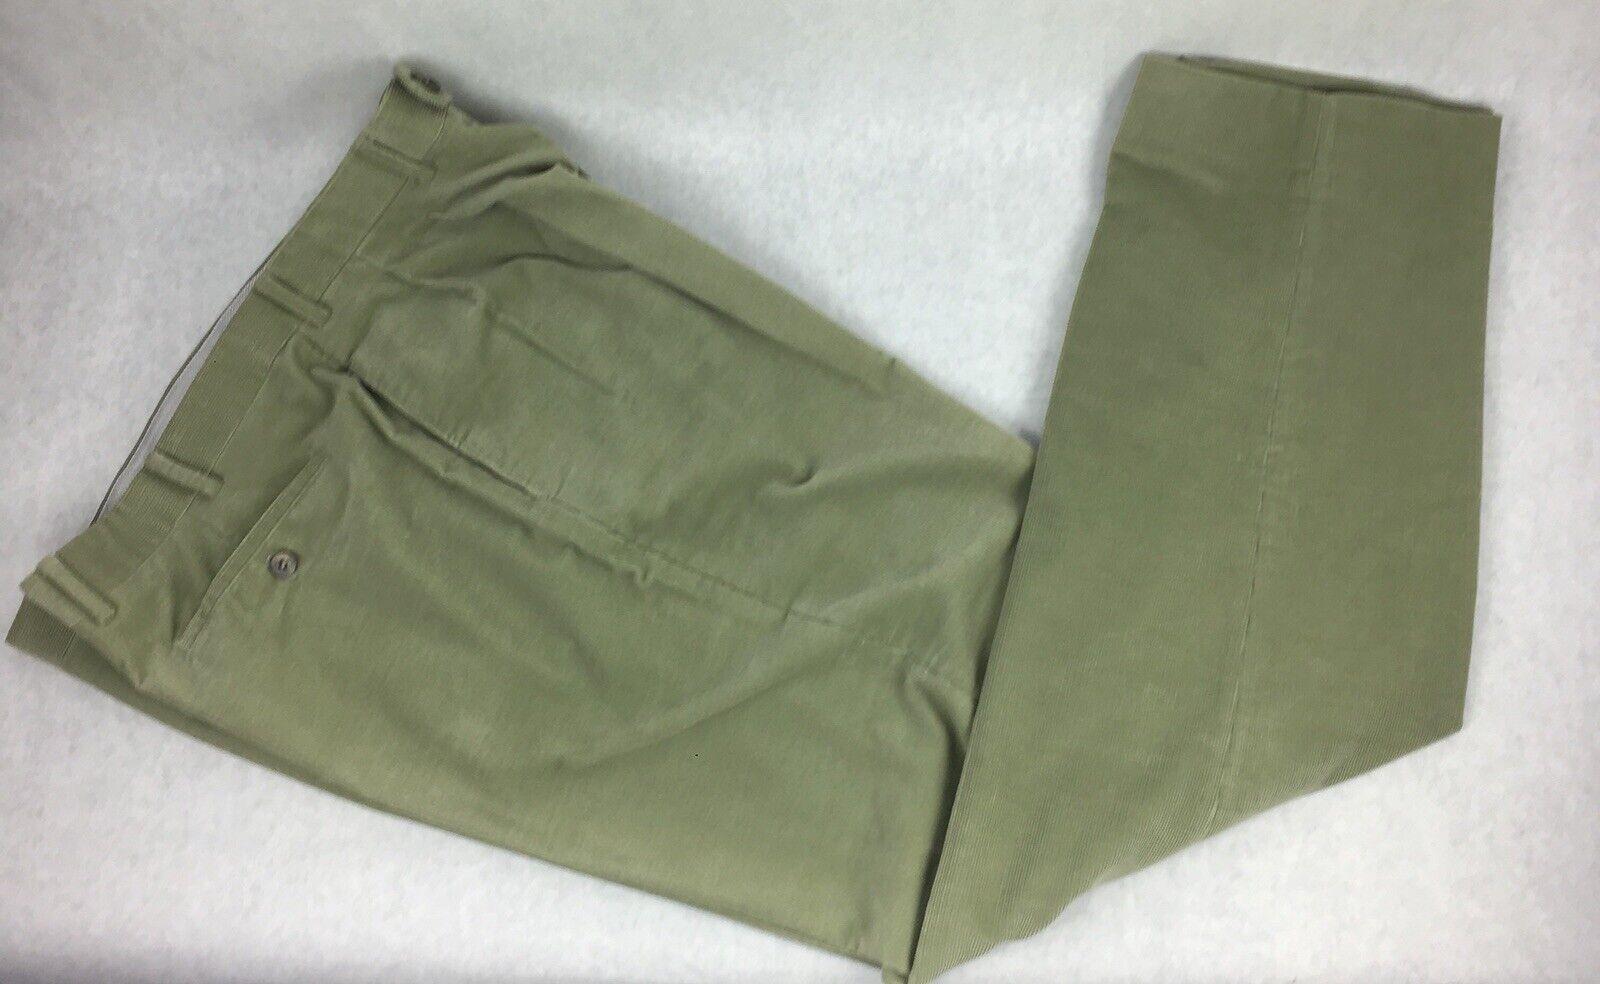 Lgold Piana Olive Green Cotton Corduroy Pants 54 IT - 44 US - L